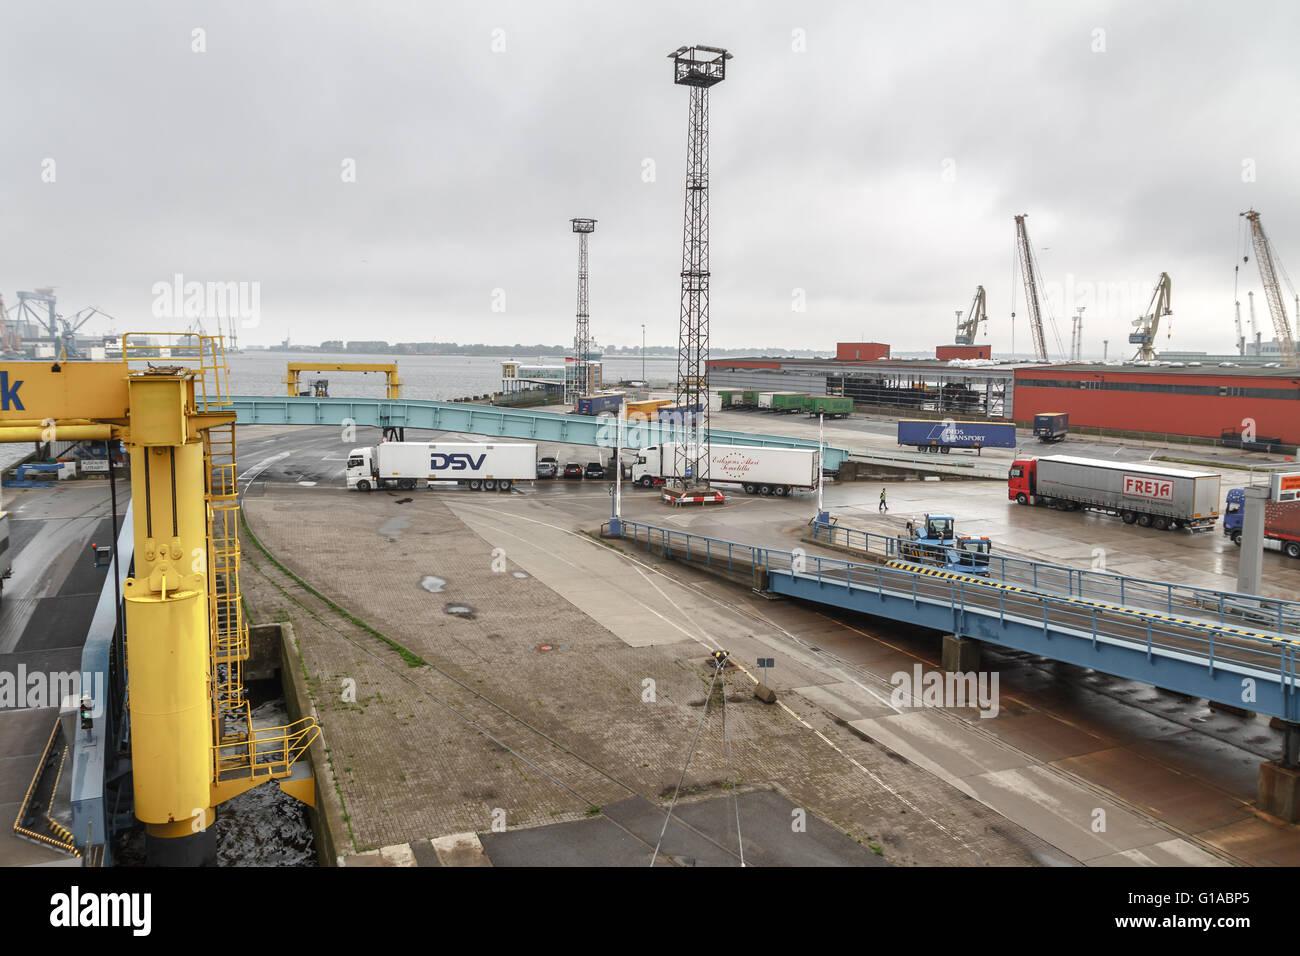 Rostok port, Germany, the trucks embark on ferry-boat - Stock Image